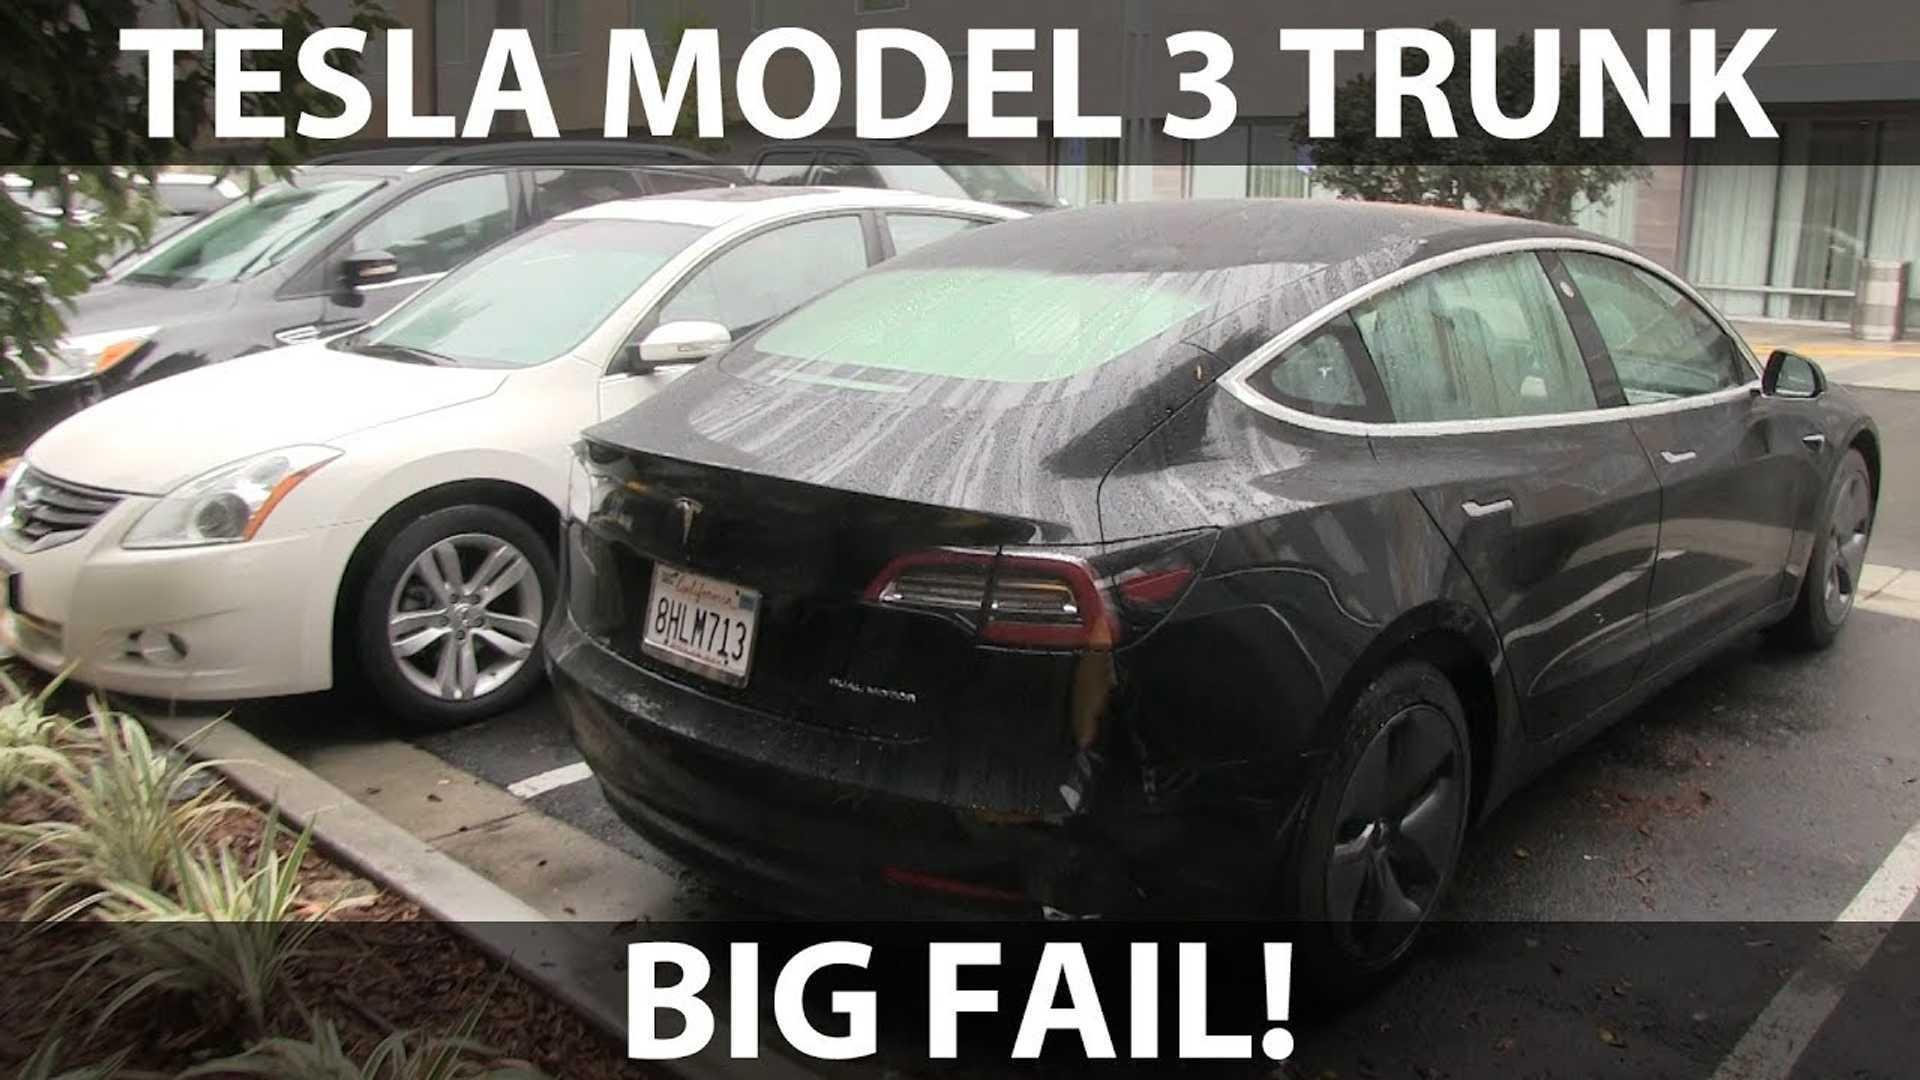 Opening Tesla Model 3 Trunk In Rain Is Not Advised Video